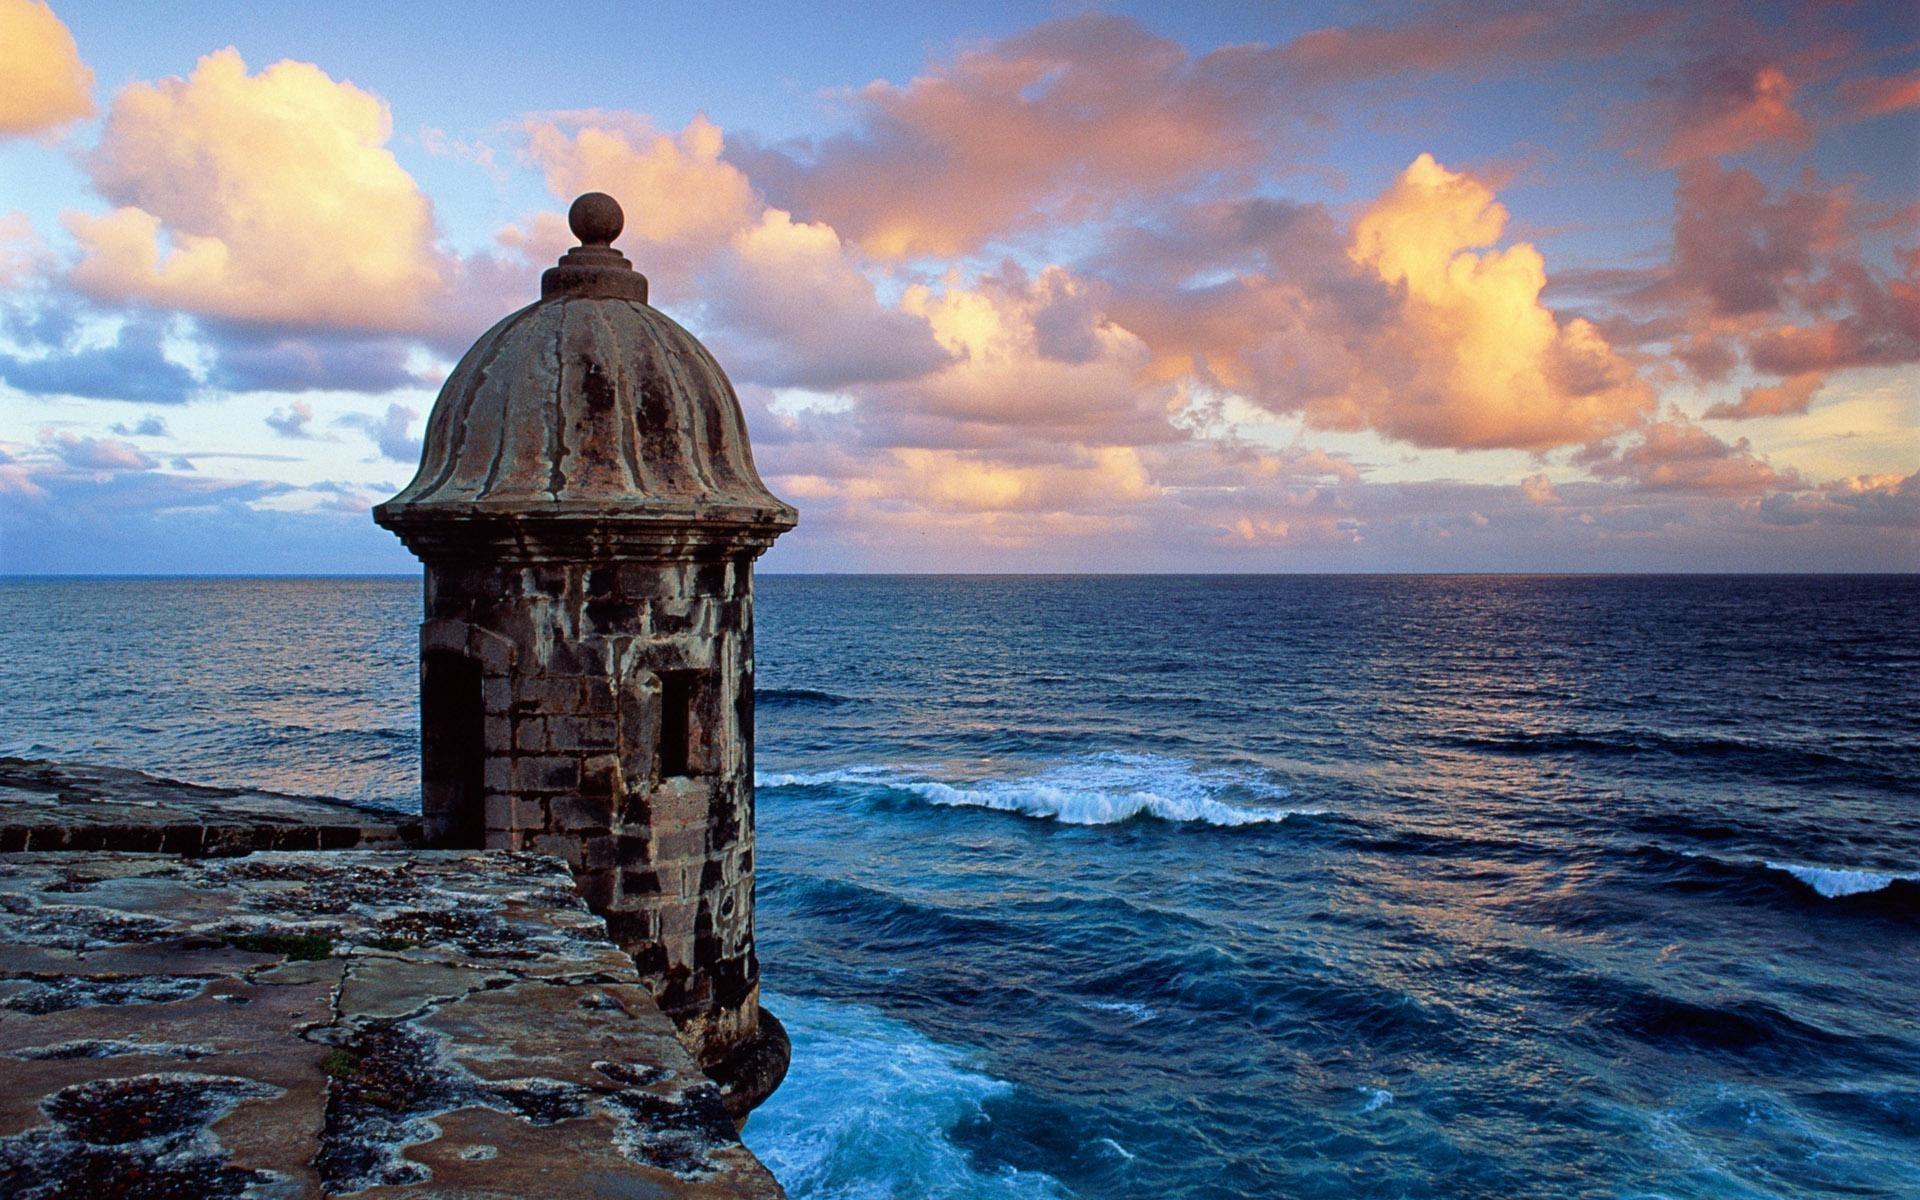 10 Best Puerto Rico Wallpaper Hd FULL HD 1080p For PC Desktop